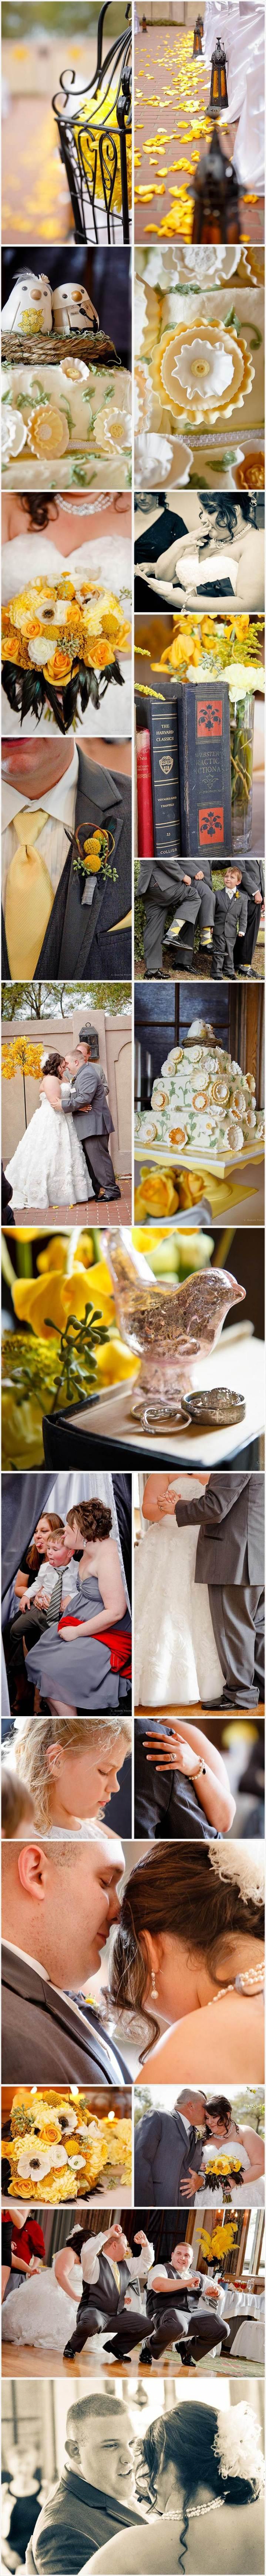 Yellow, Grey, Silver, Birds, Wedding, houston Wedding Photographer, Houston Wedding Videographer, Swanky Photobooth,